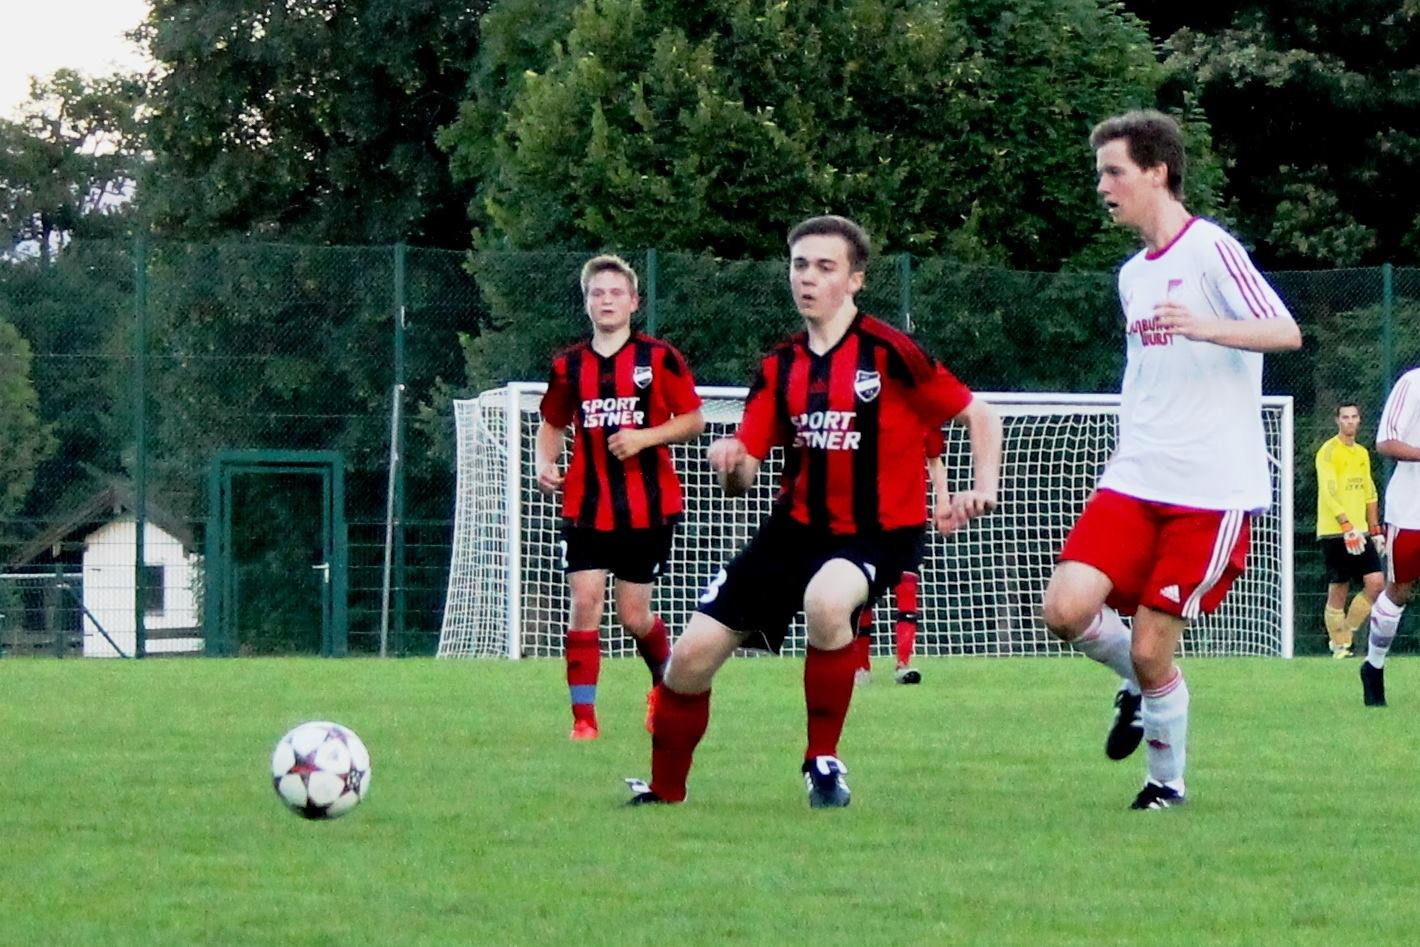 Erstes Spiel (Pokal gegen SV Miesbach am 20.7.2016)